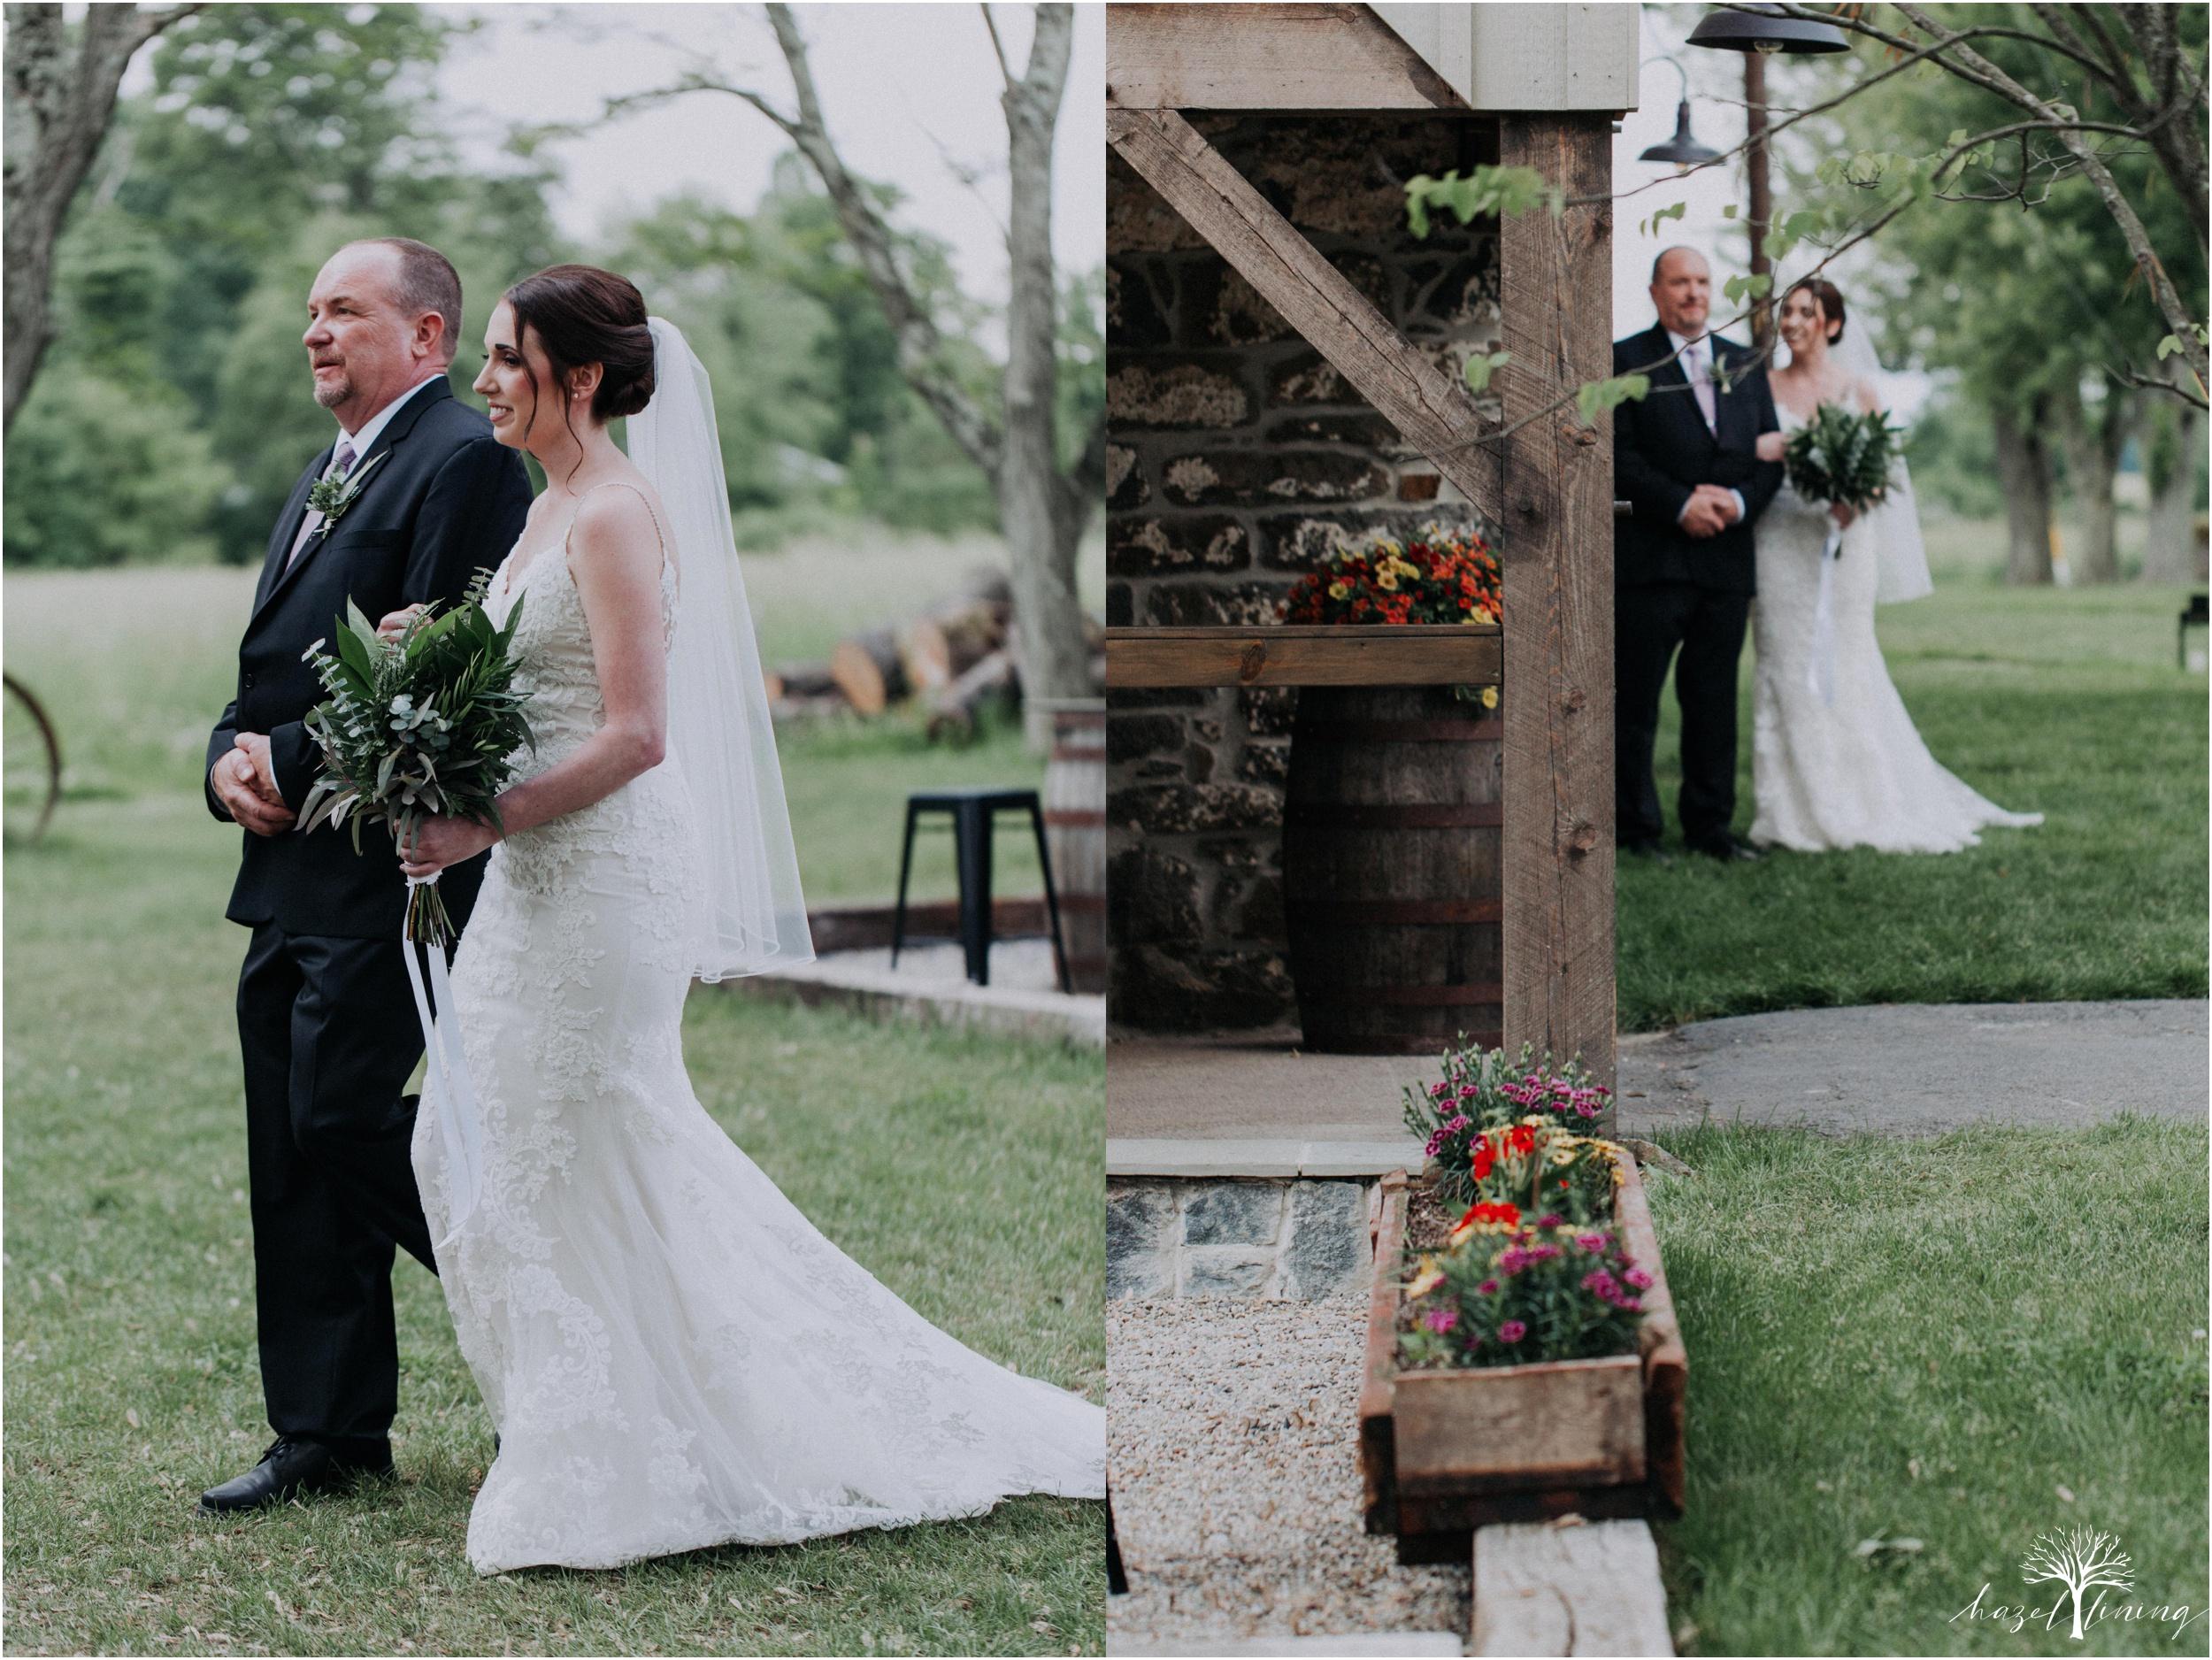 hazel-lining-travel-wedding-elopement-photography-lisa-landon-shoemaker-the-farm-bakery-and-events-bucks-county-quakertown-pennsylvania-summer-country-outdoor-farm-wedding_0051.jpg